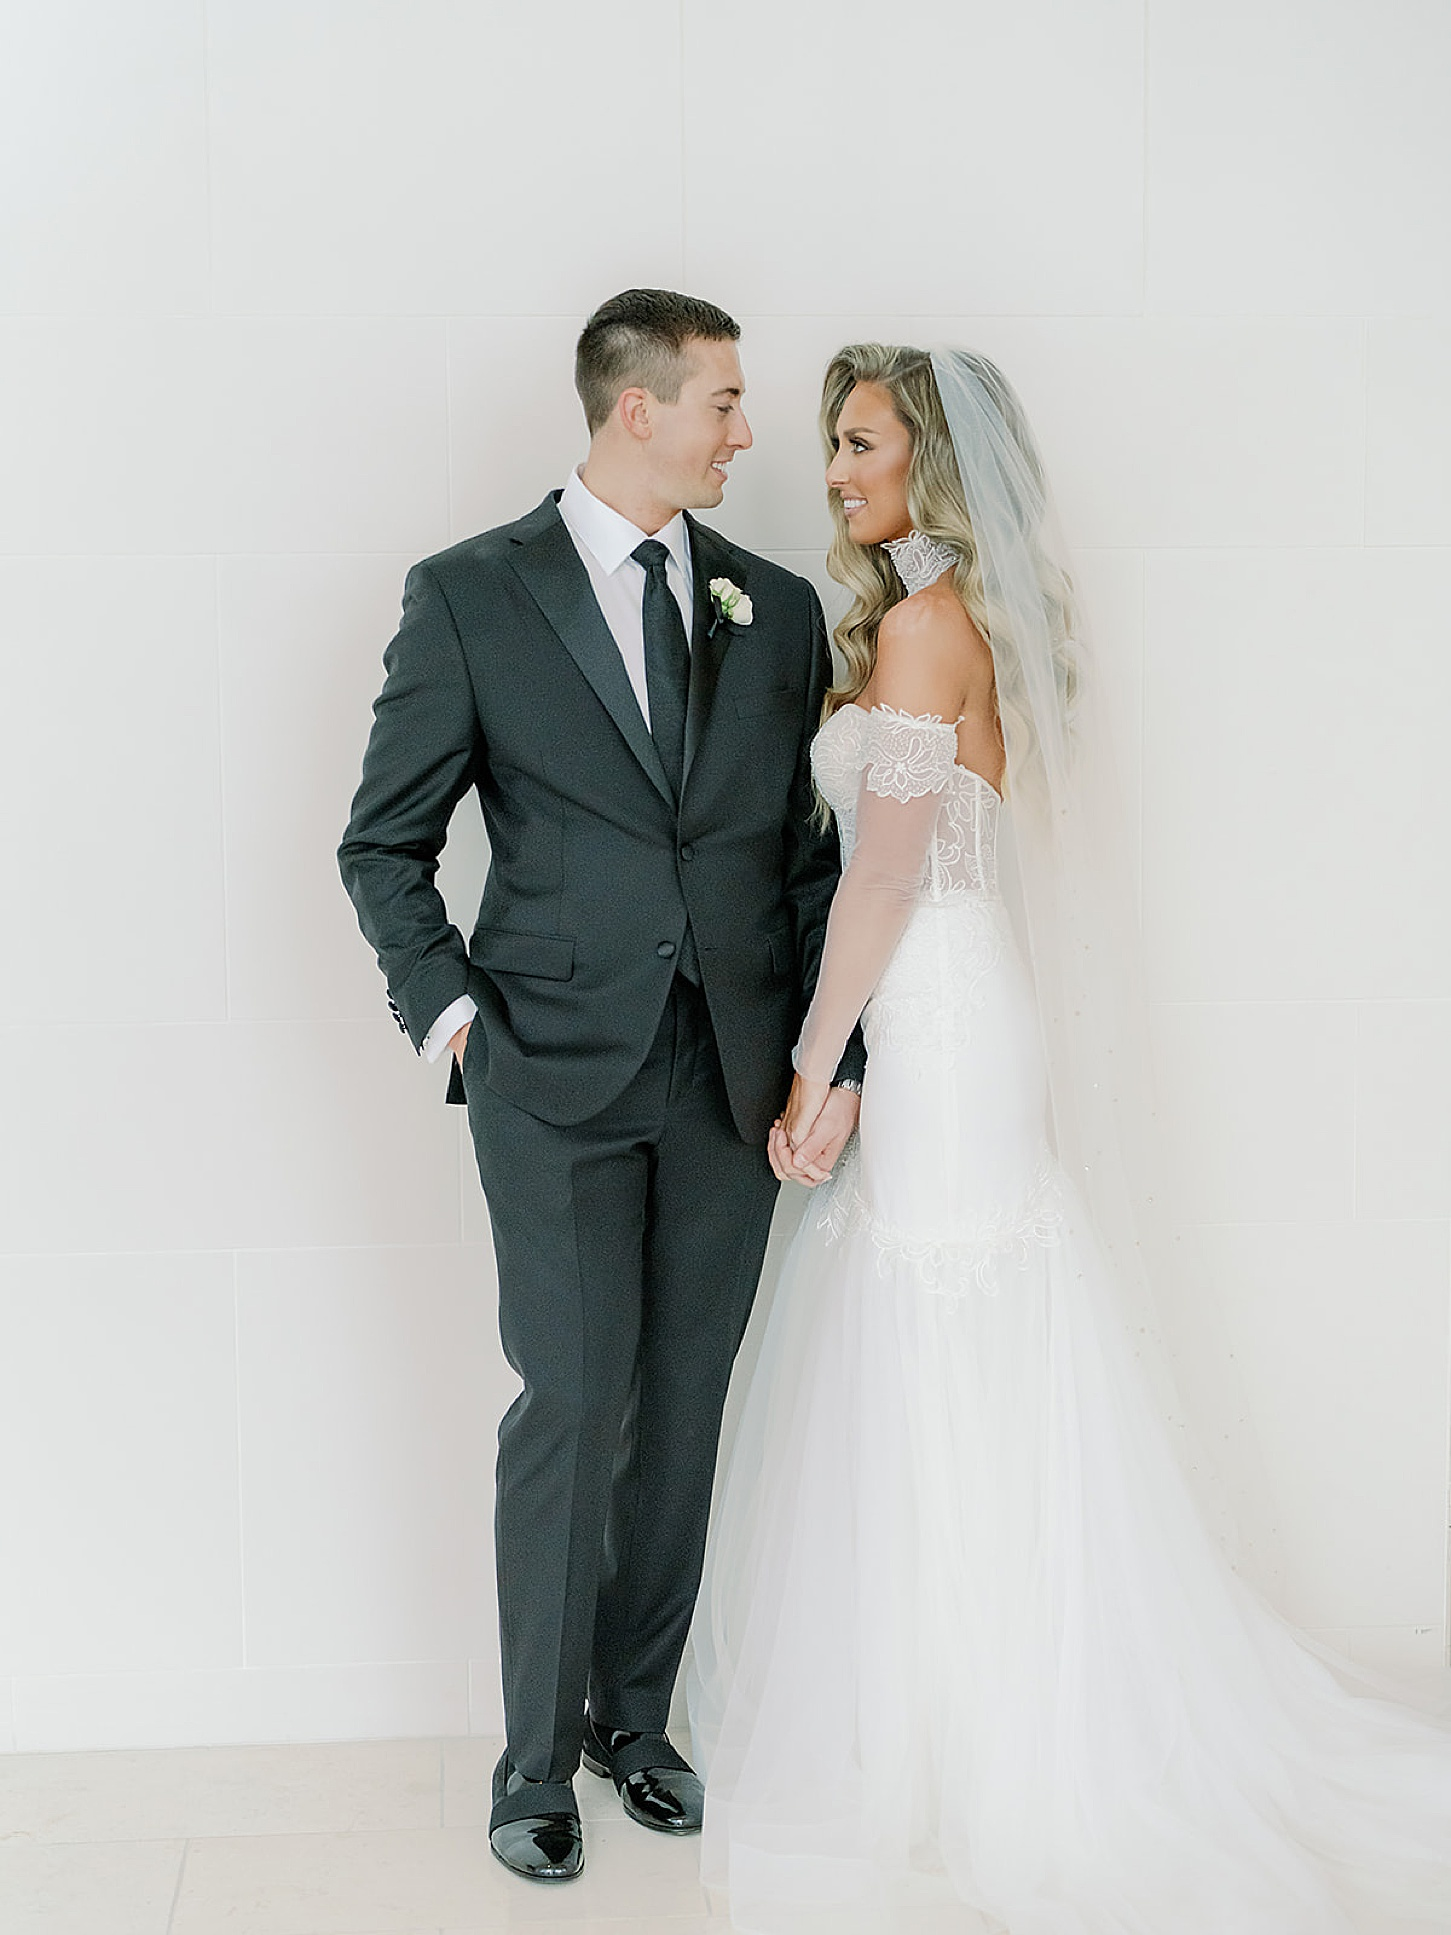 Atlantic City Wedding Photography Studio by Magdalena Studios Lexy Cha 0056